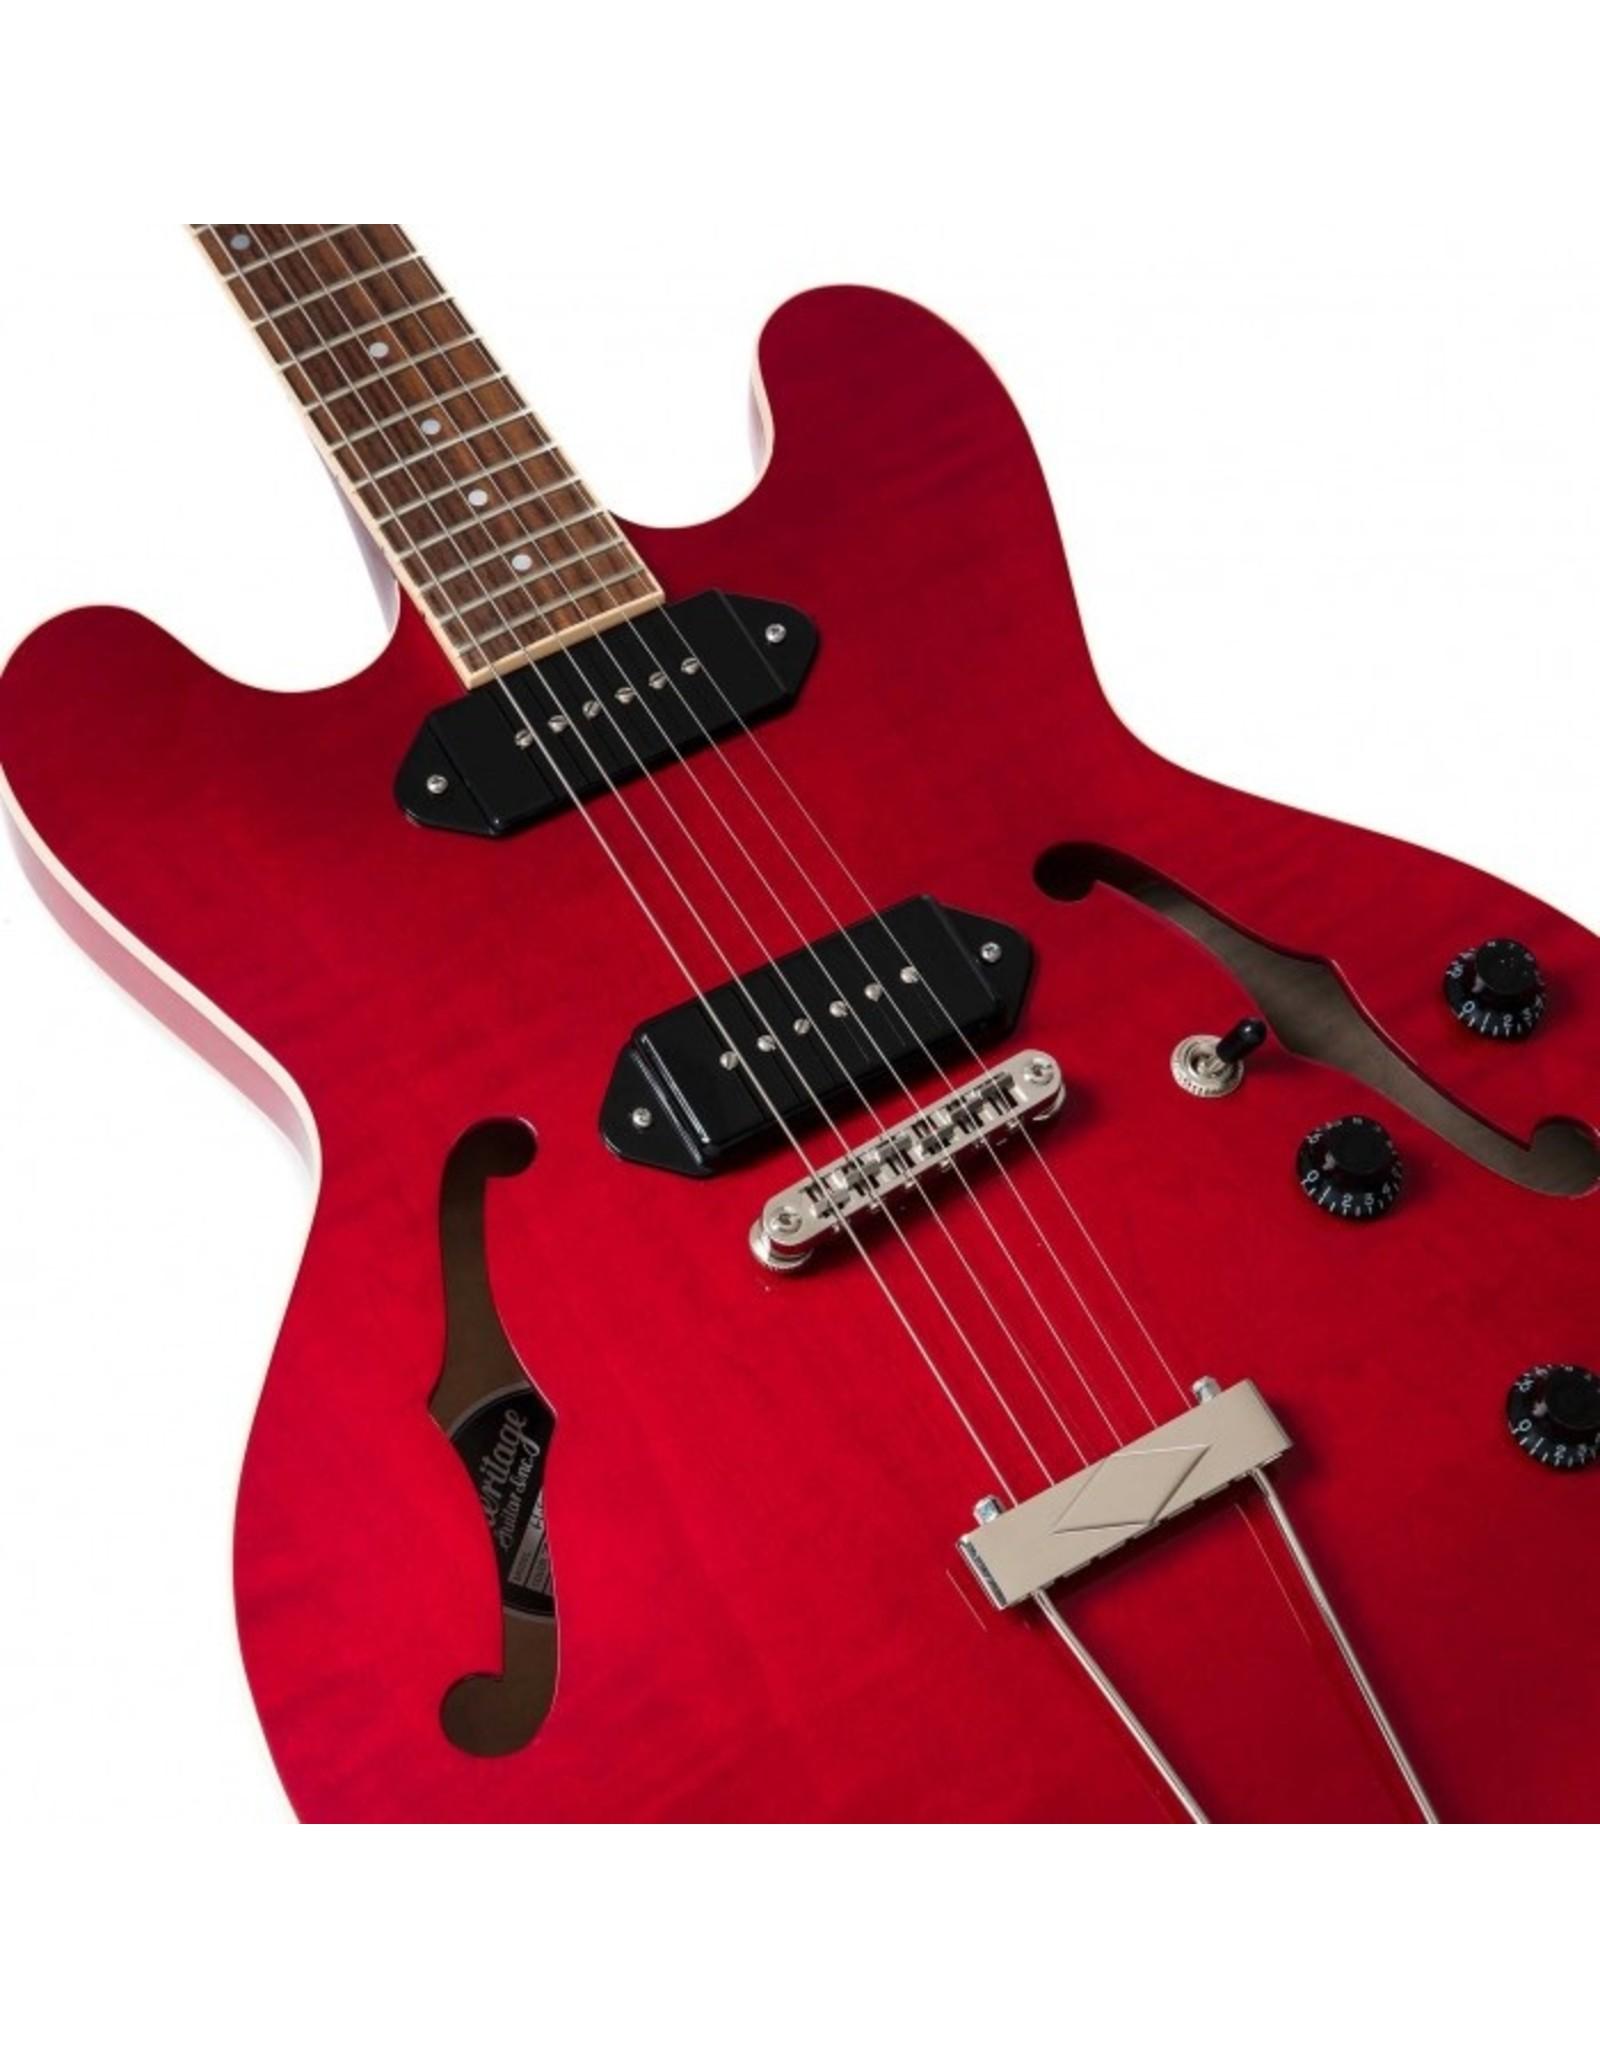 Heritage Guitars Heritage H 530 Trans Cherry